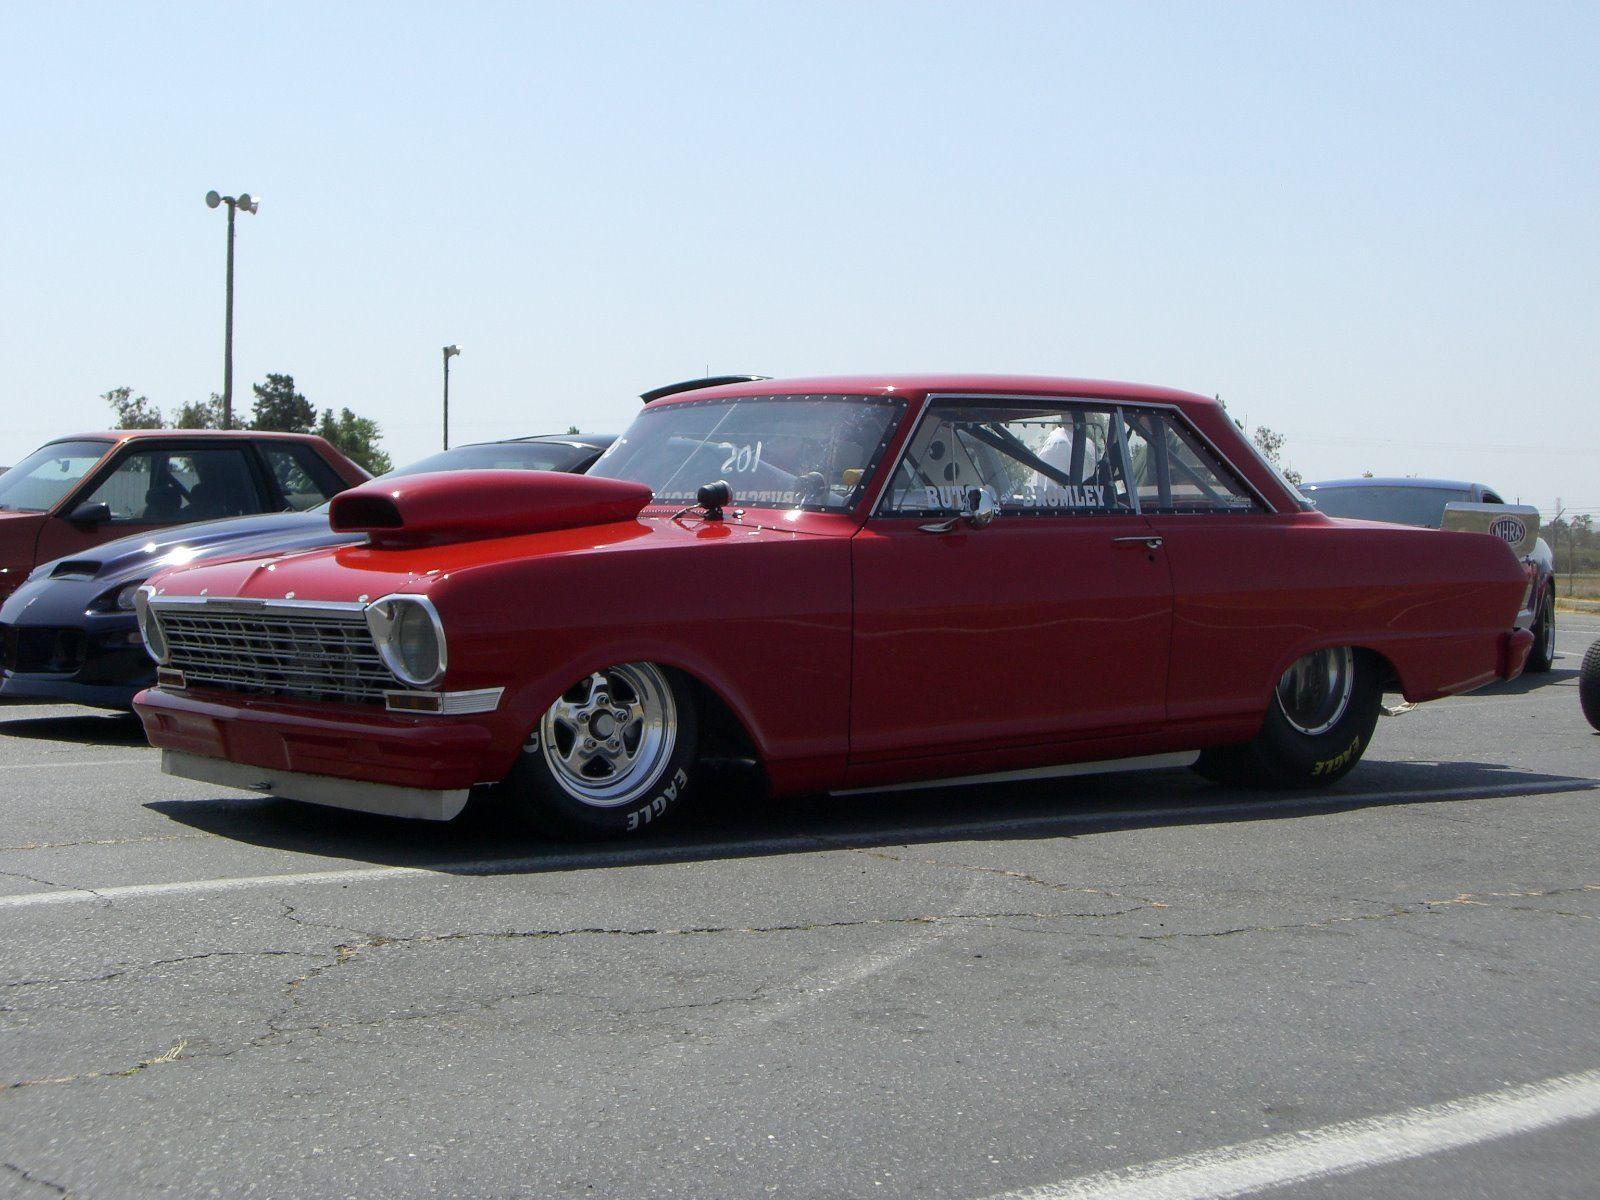 1964 Chevrolet Nova Drag Racing Race Car Chevy Ii Hot